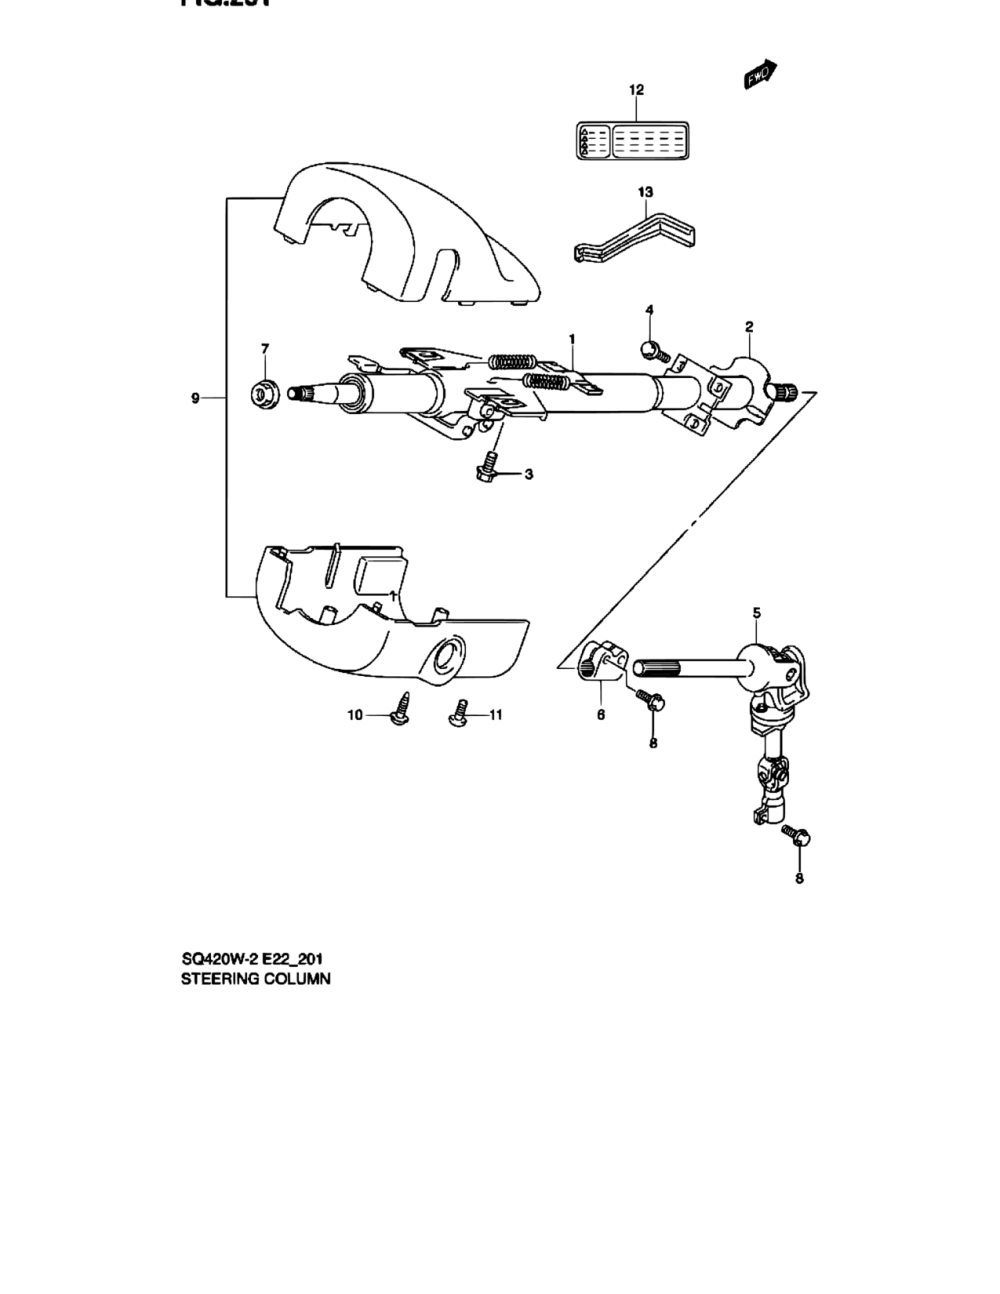 medium resolution of kenworth steering column diagram wiring diagrams bright kenworth steering column diagram